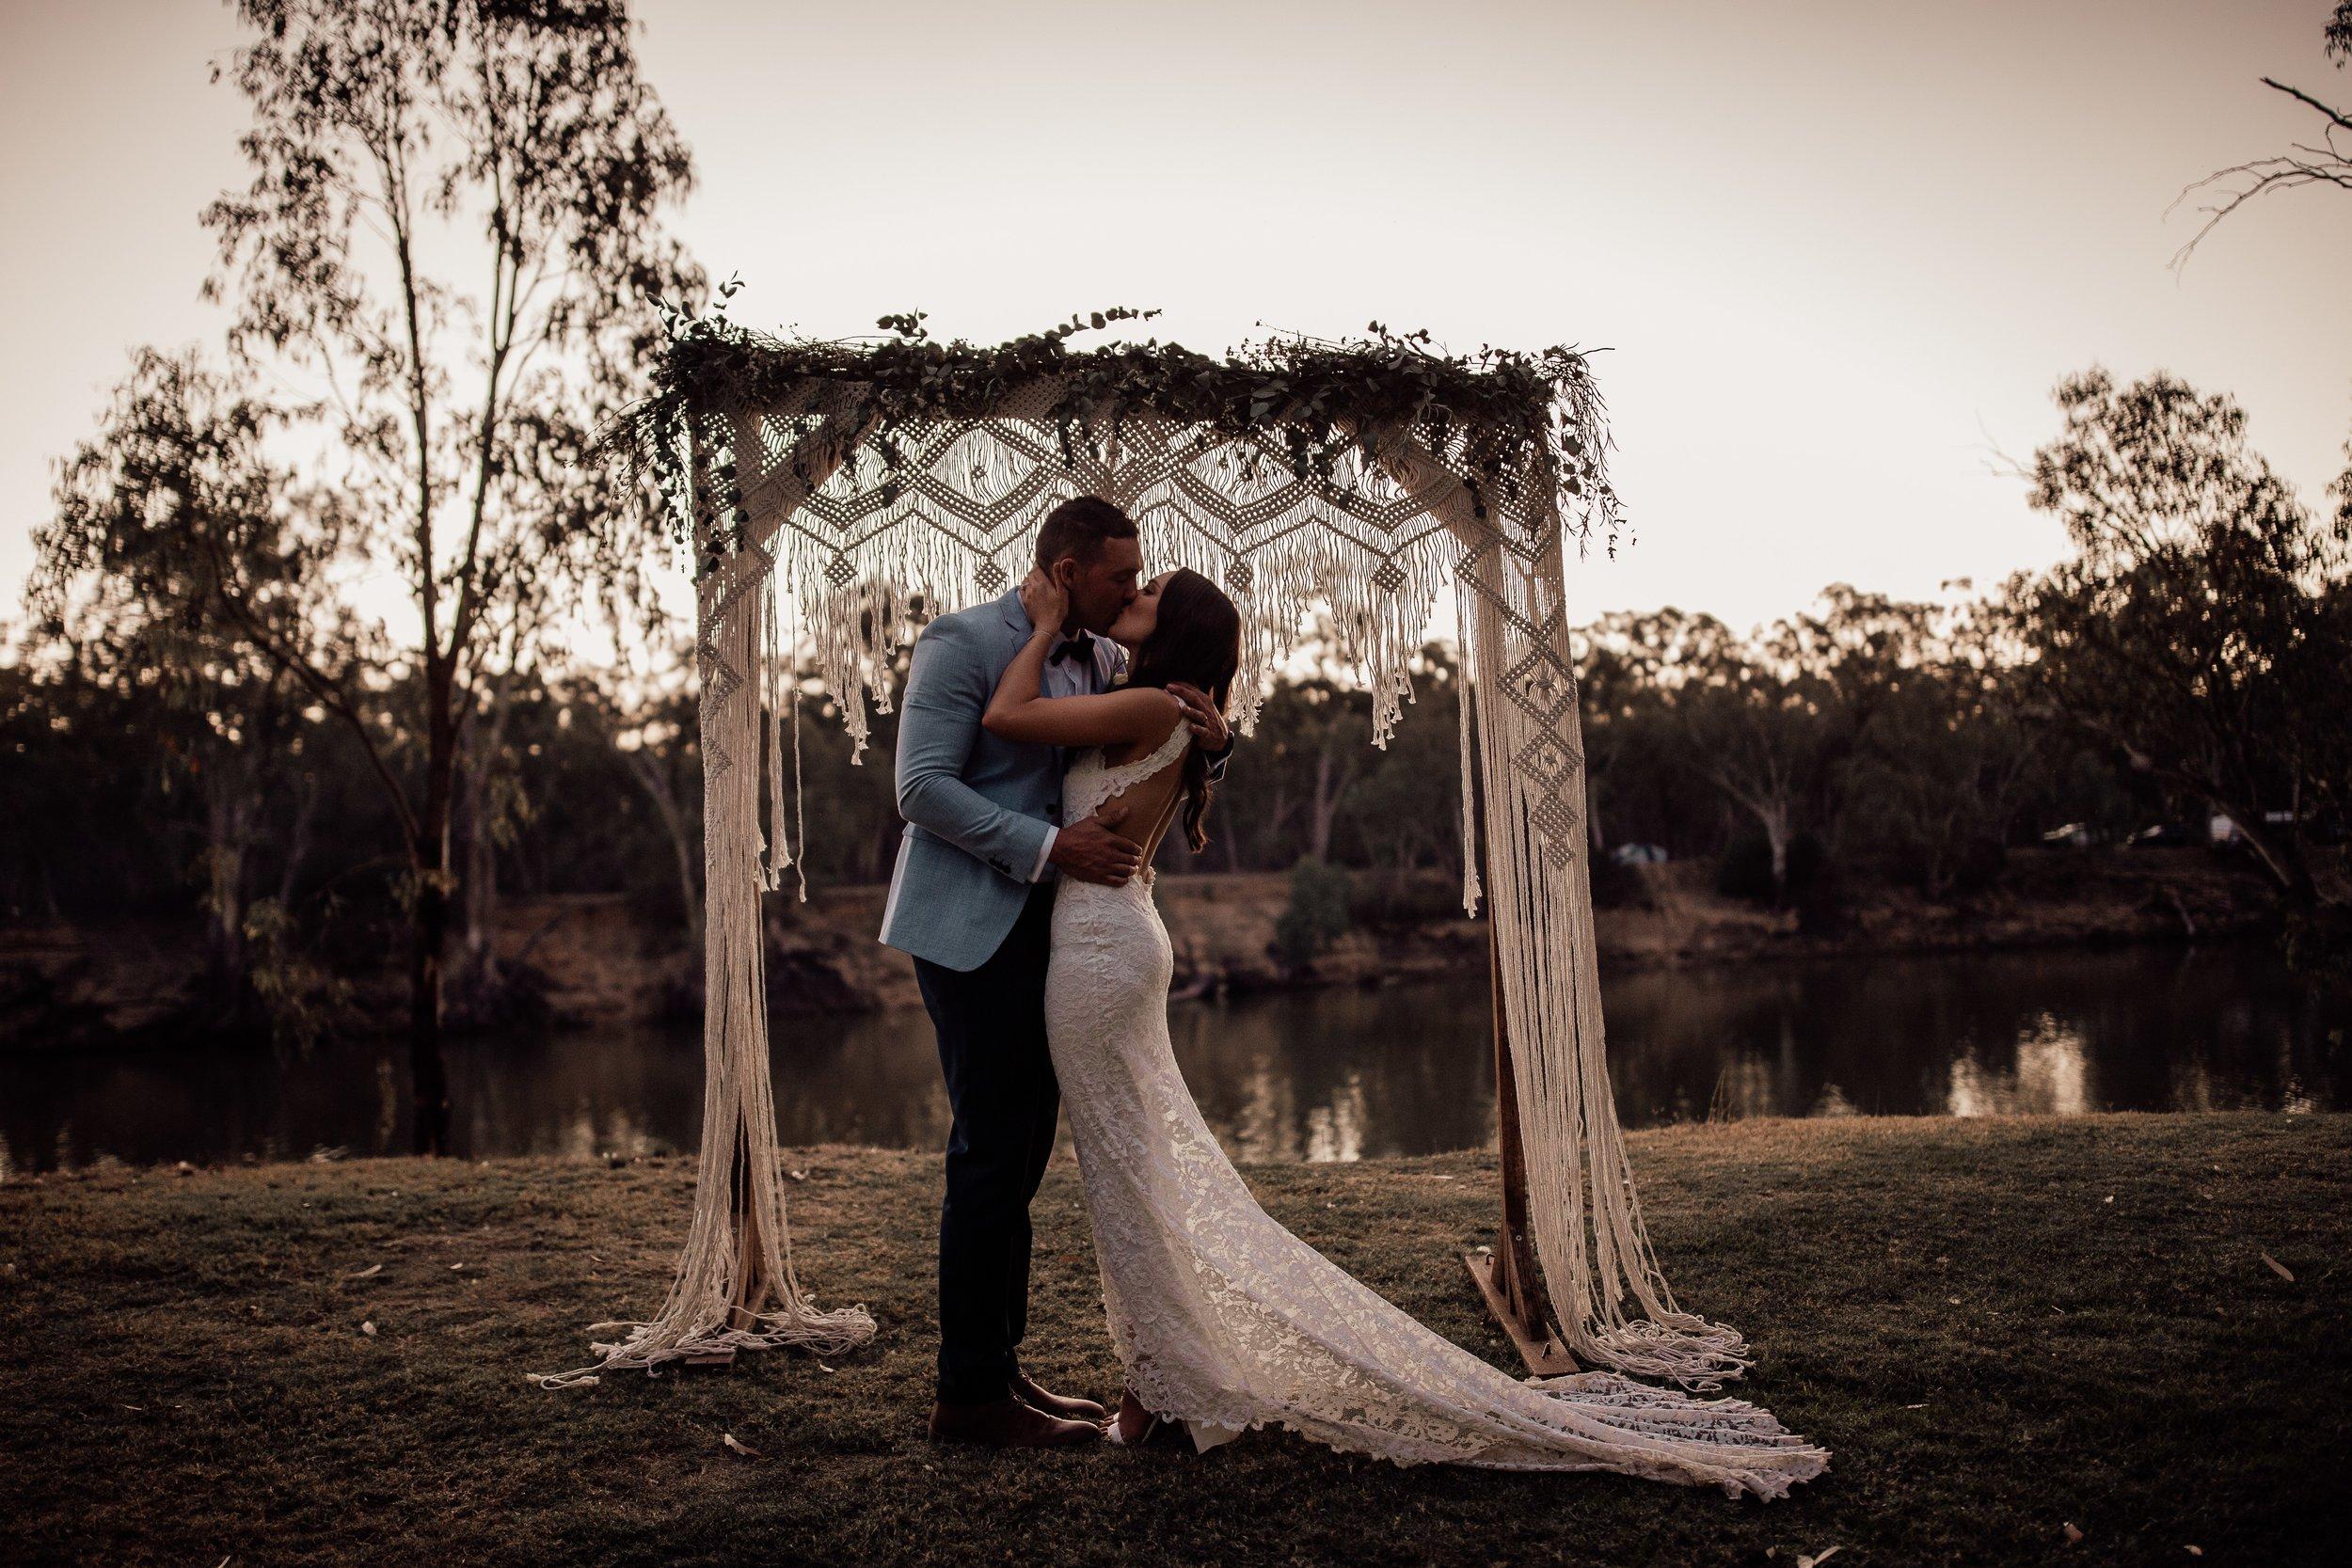 mickalathomas_puremacphotography_weddingphotographer_couplephotographer_Sheppartonphotographer_2935.jpg